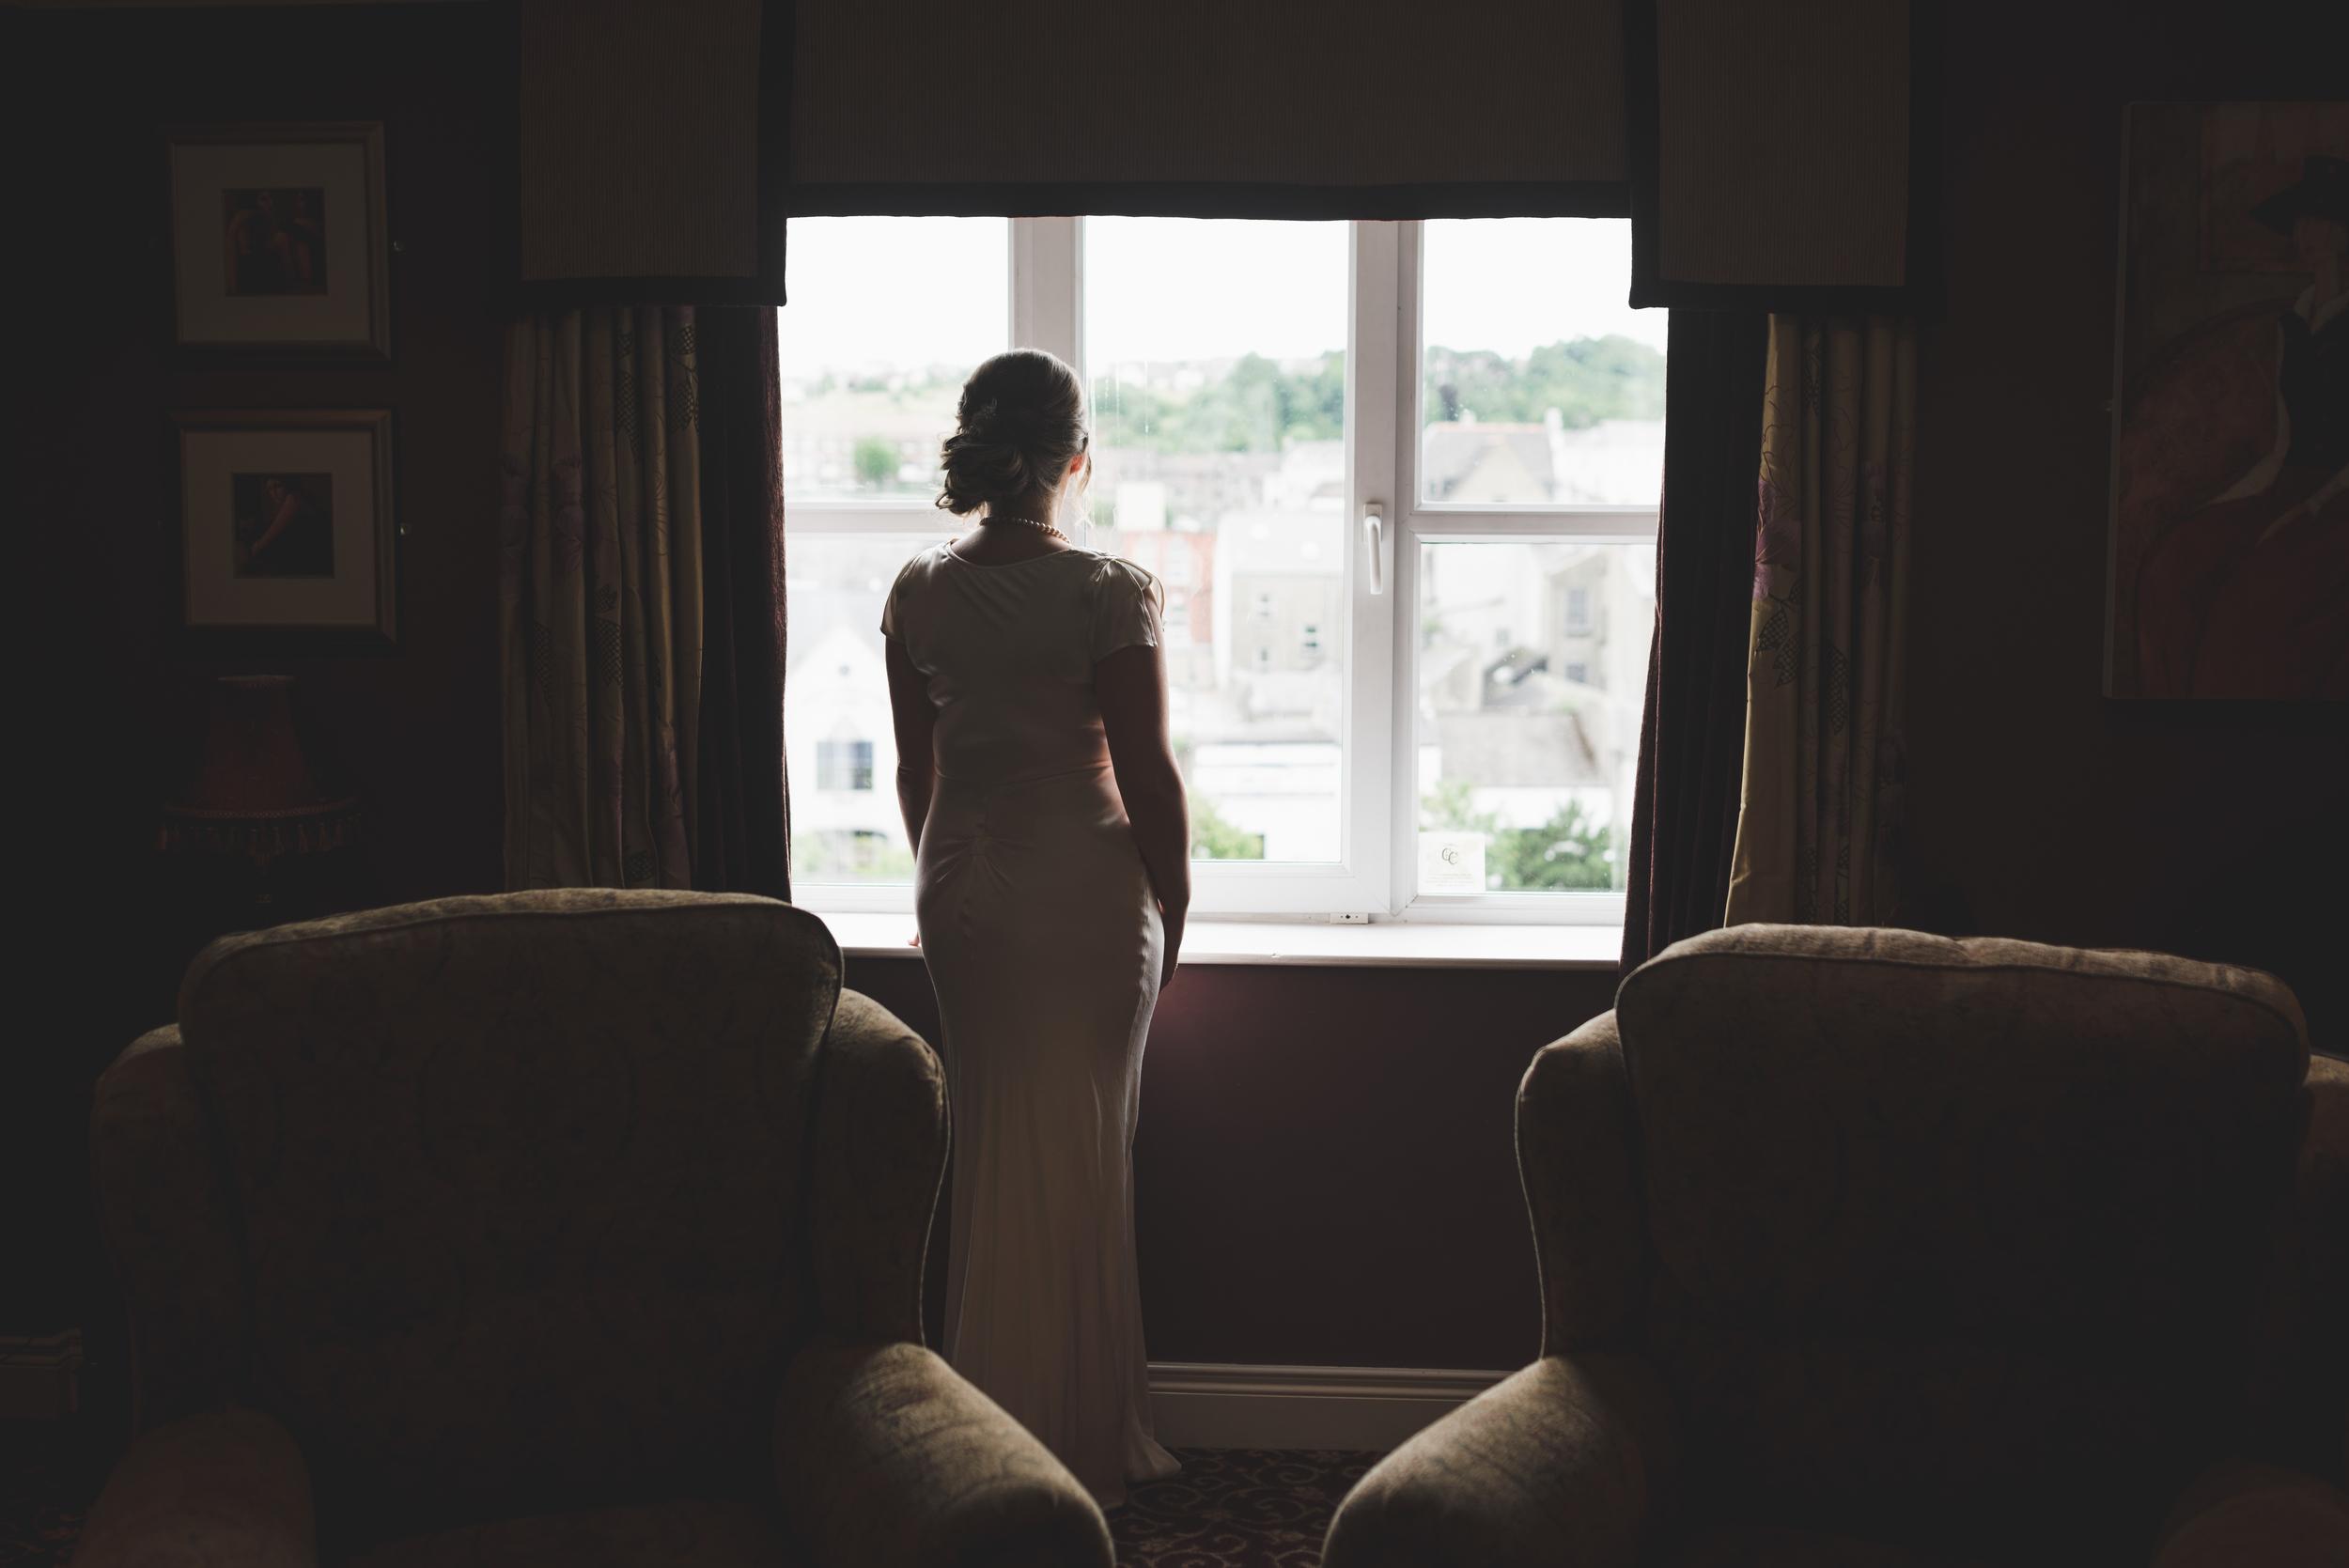 Canal Court Hotel Newry Wedding photographer Pure Photo N.I bride window